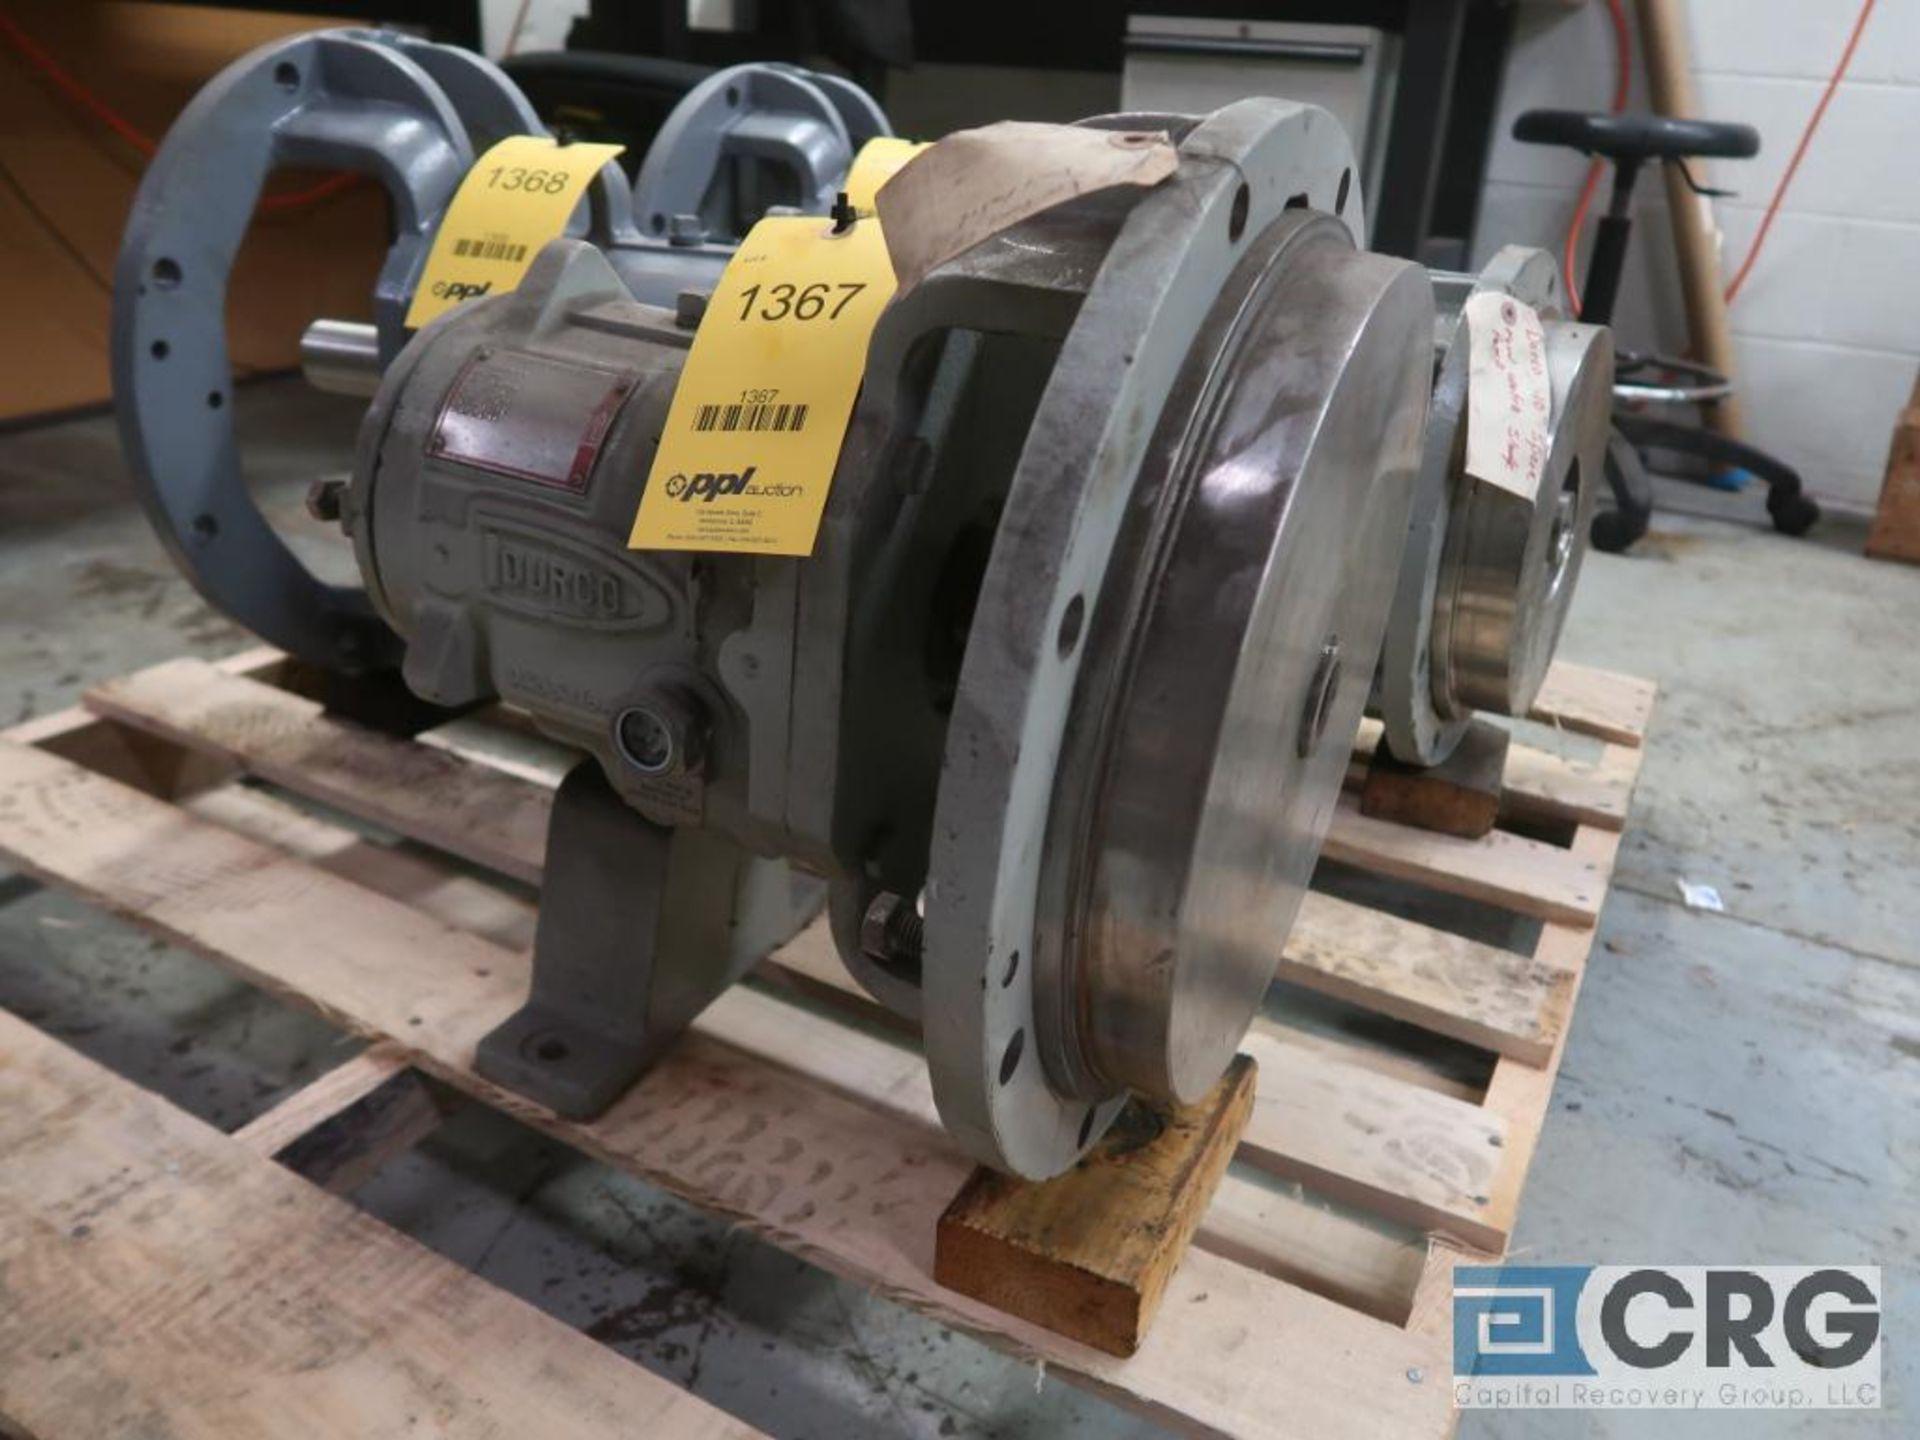 Durco PEZYA 13 LMS centrifugal pump, s/n 459739 (Basement Stores)